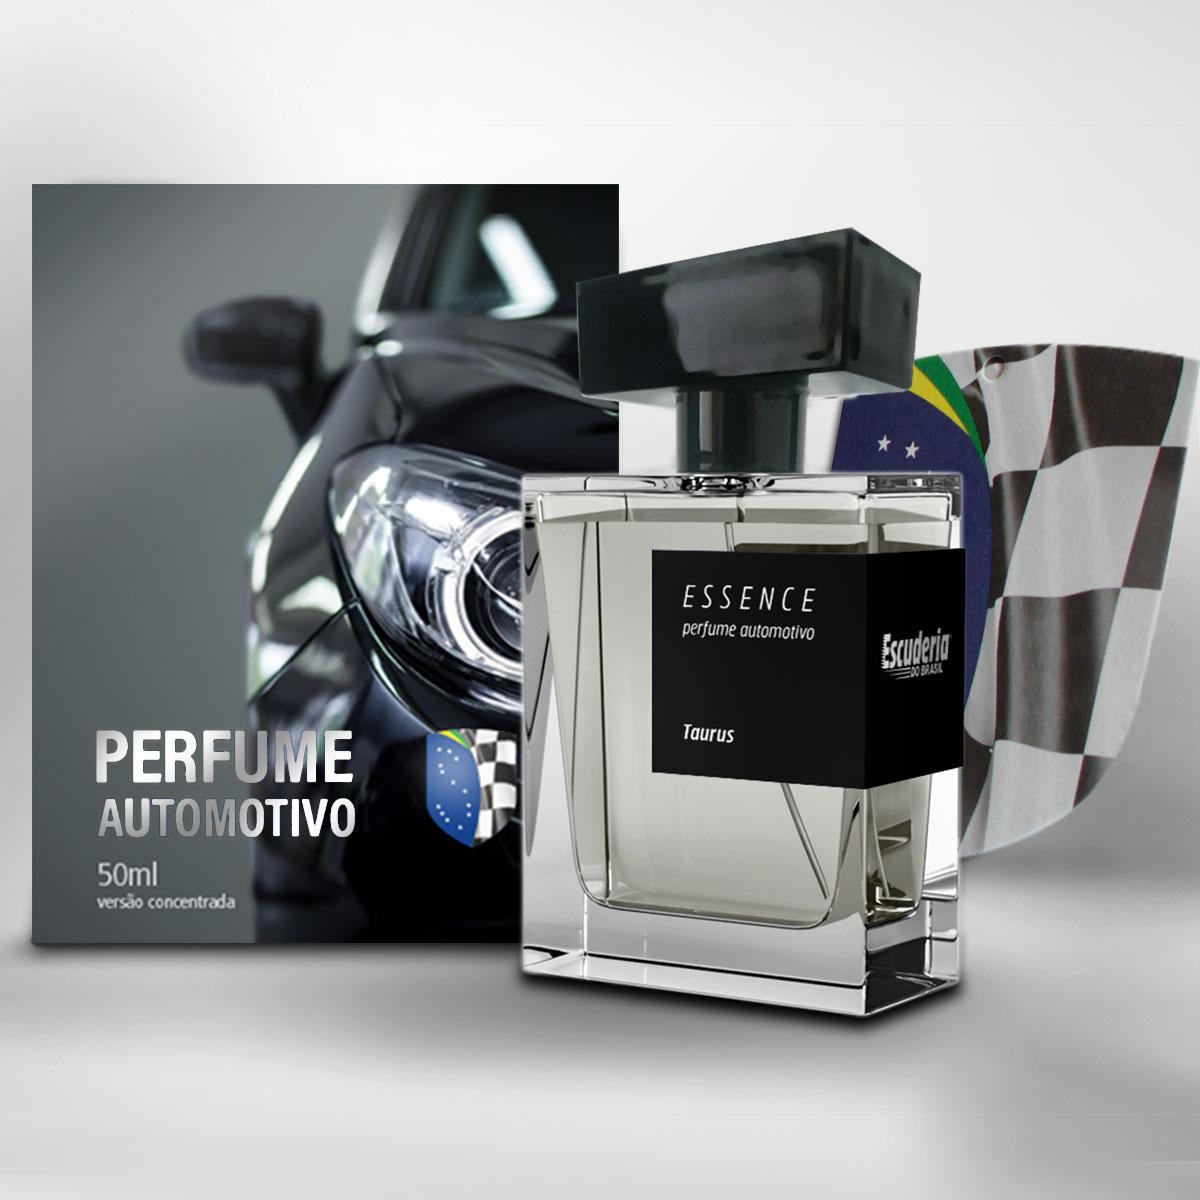 Perfume automotivo concentrado 50ml Taurus - Escuderia do Brasil